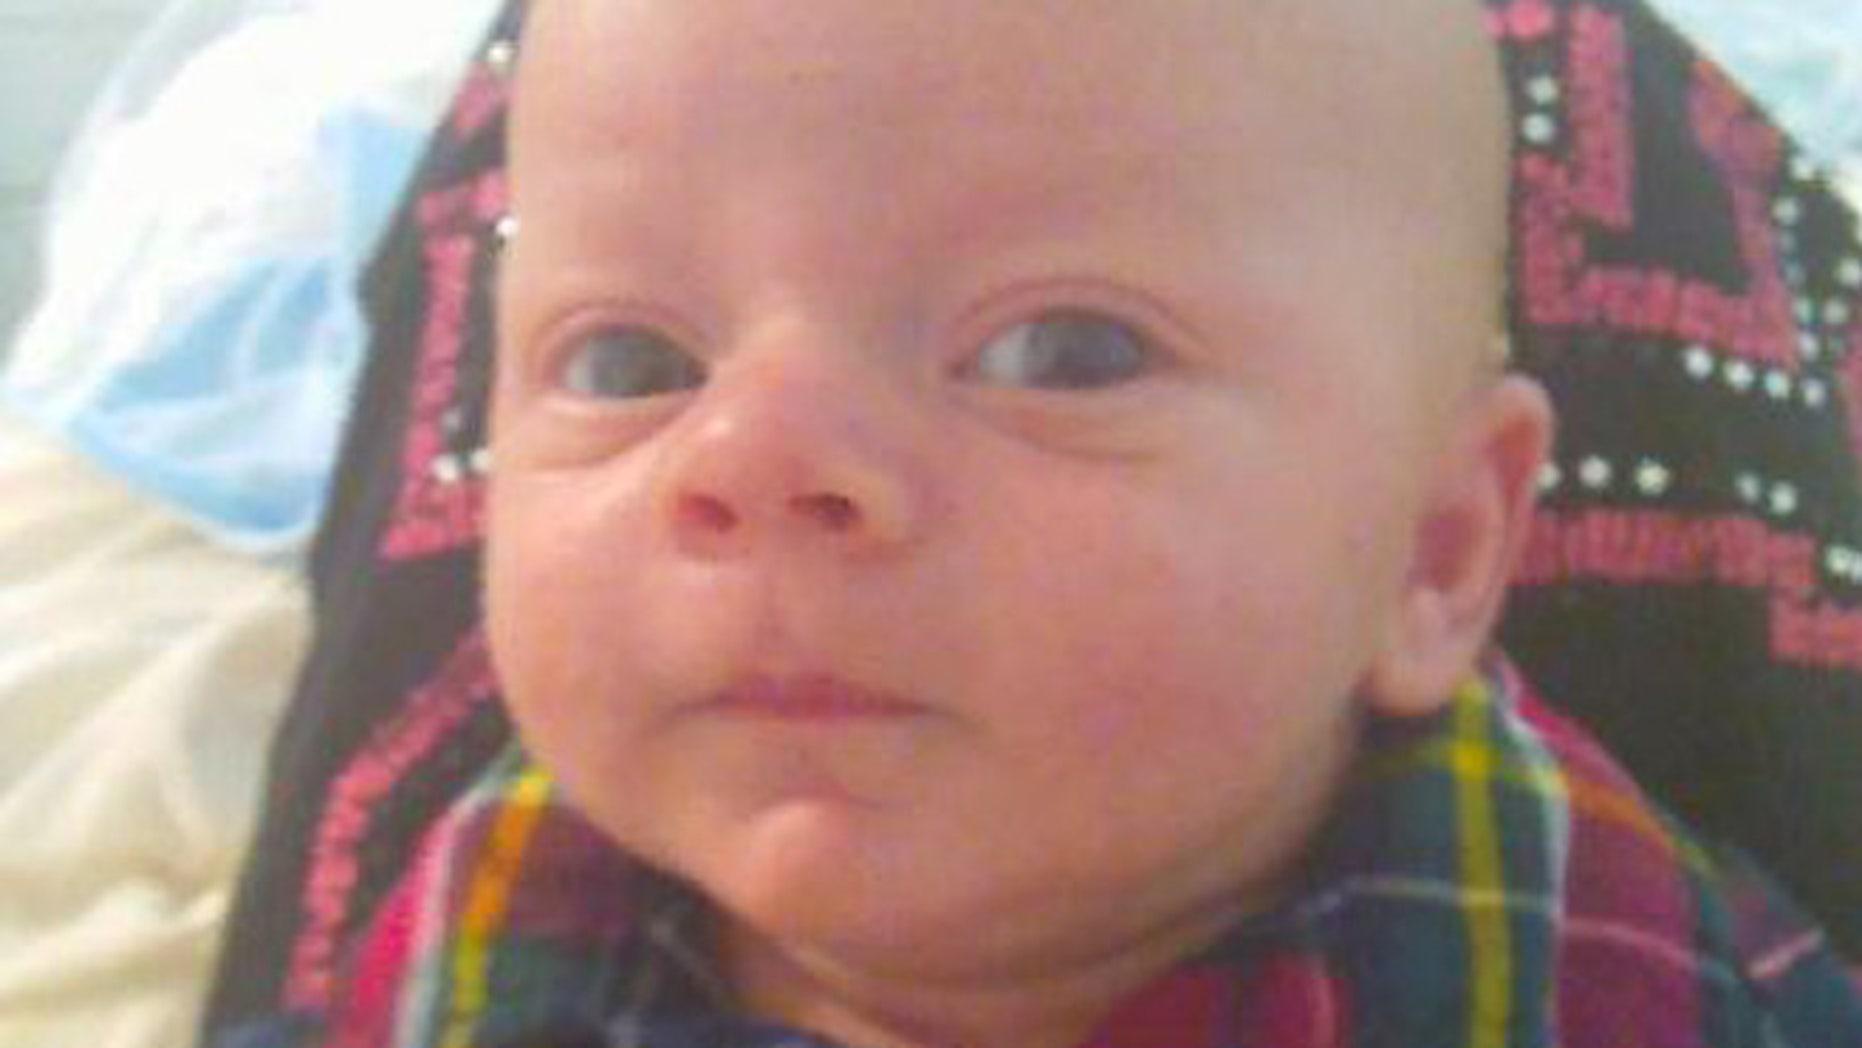 Nine-week-old Chance Walsh, of North Port, Fla., was last seen Sept. 9.